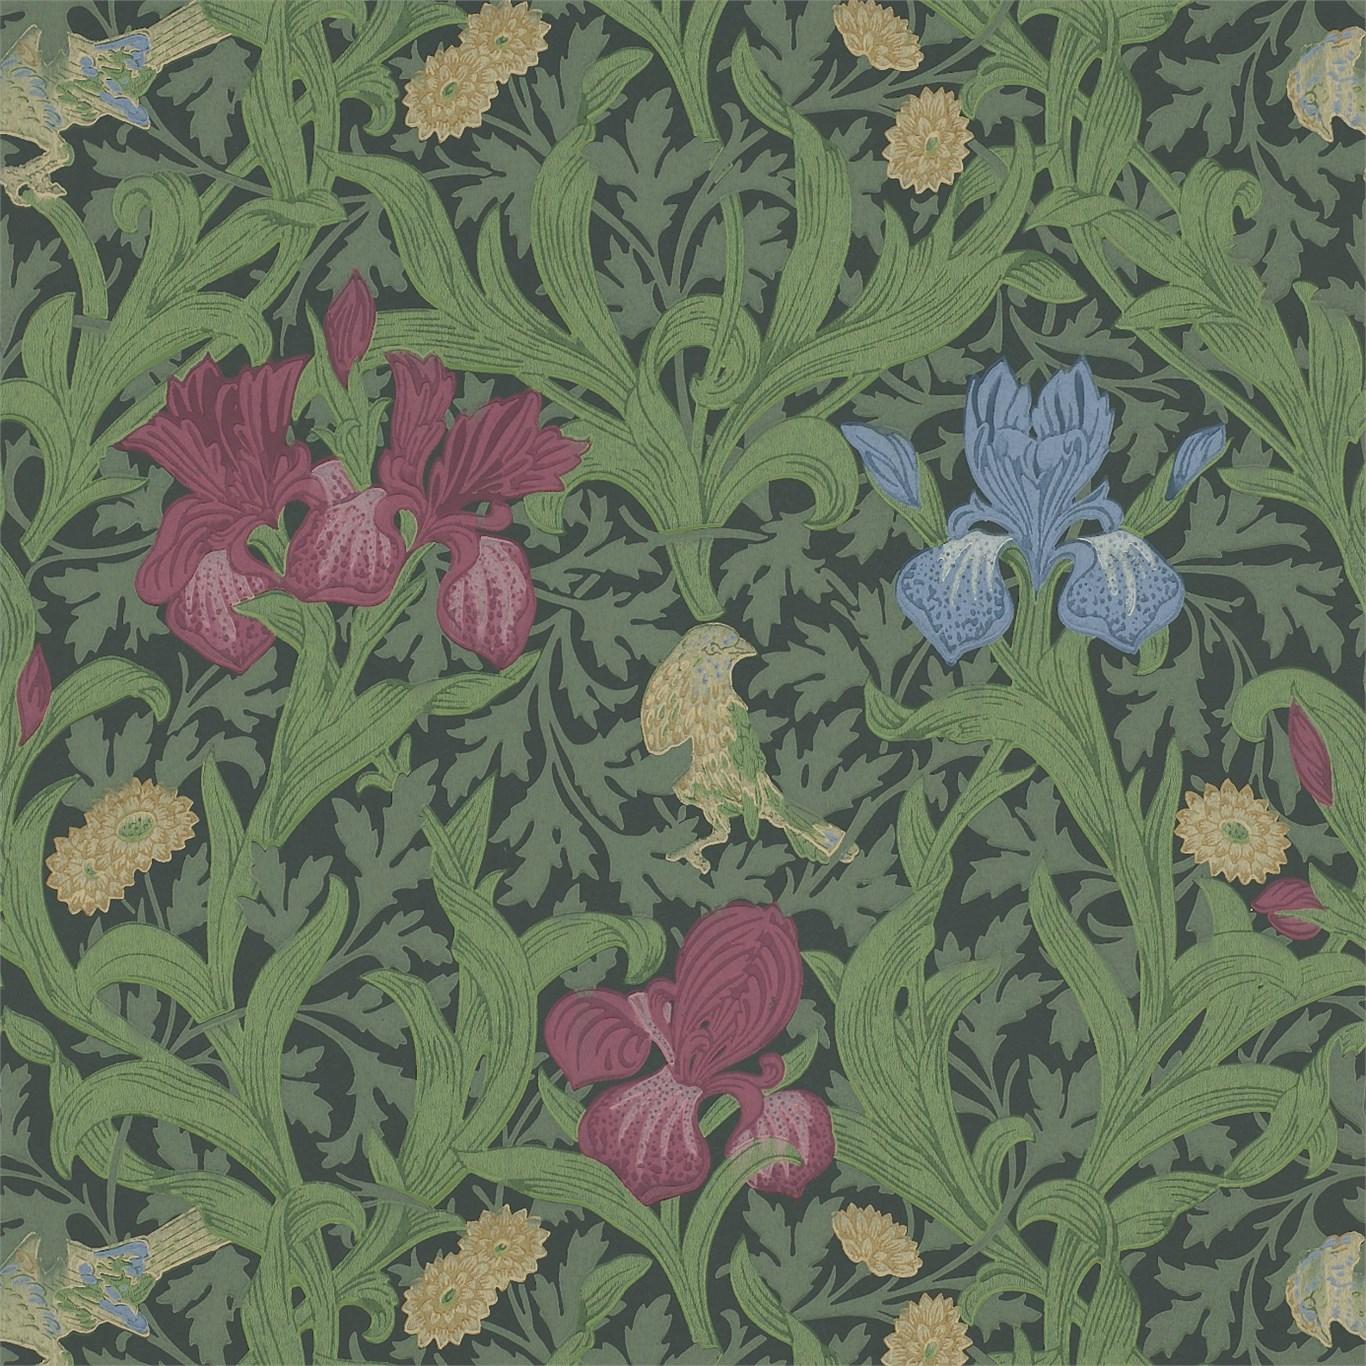 William Morris Wallpaper: Morris & Co